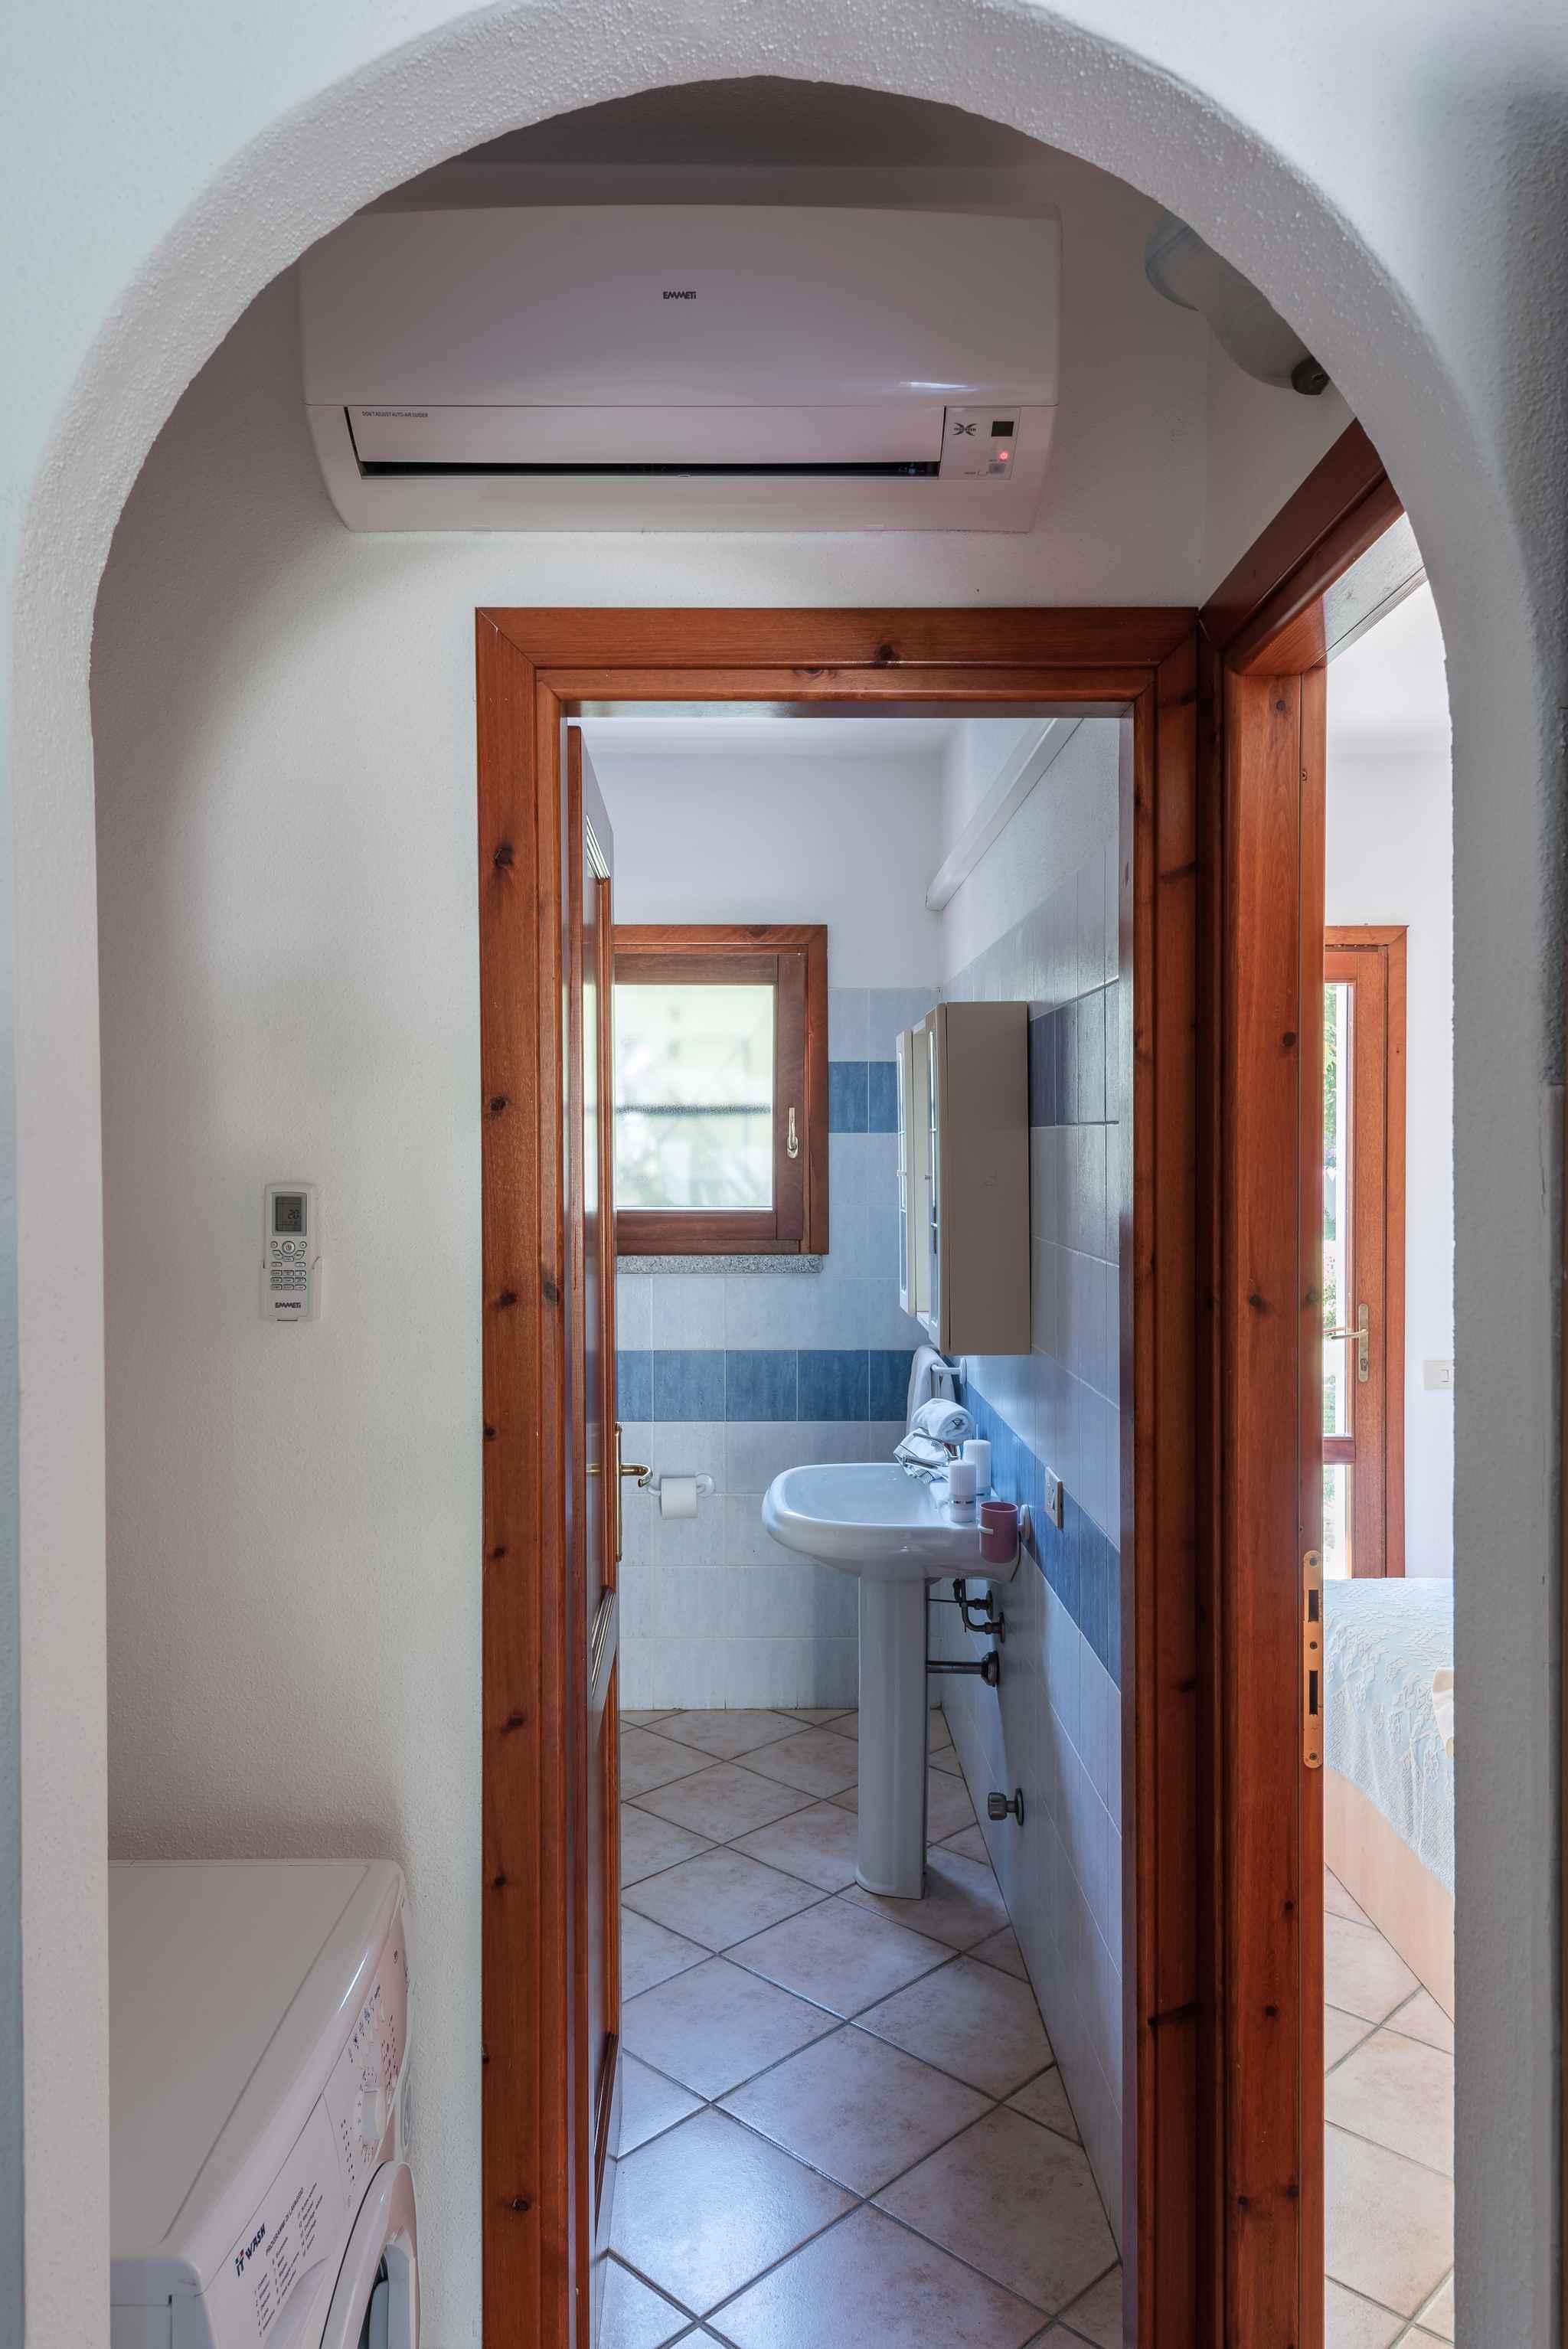 Ferienwohnung Appartamento 4 persone (2853260), Budoni, Olbia-Tempio, Sardinien, Italien, Bild 7